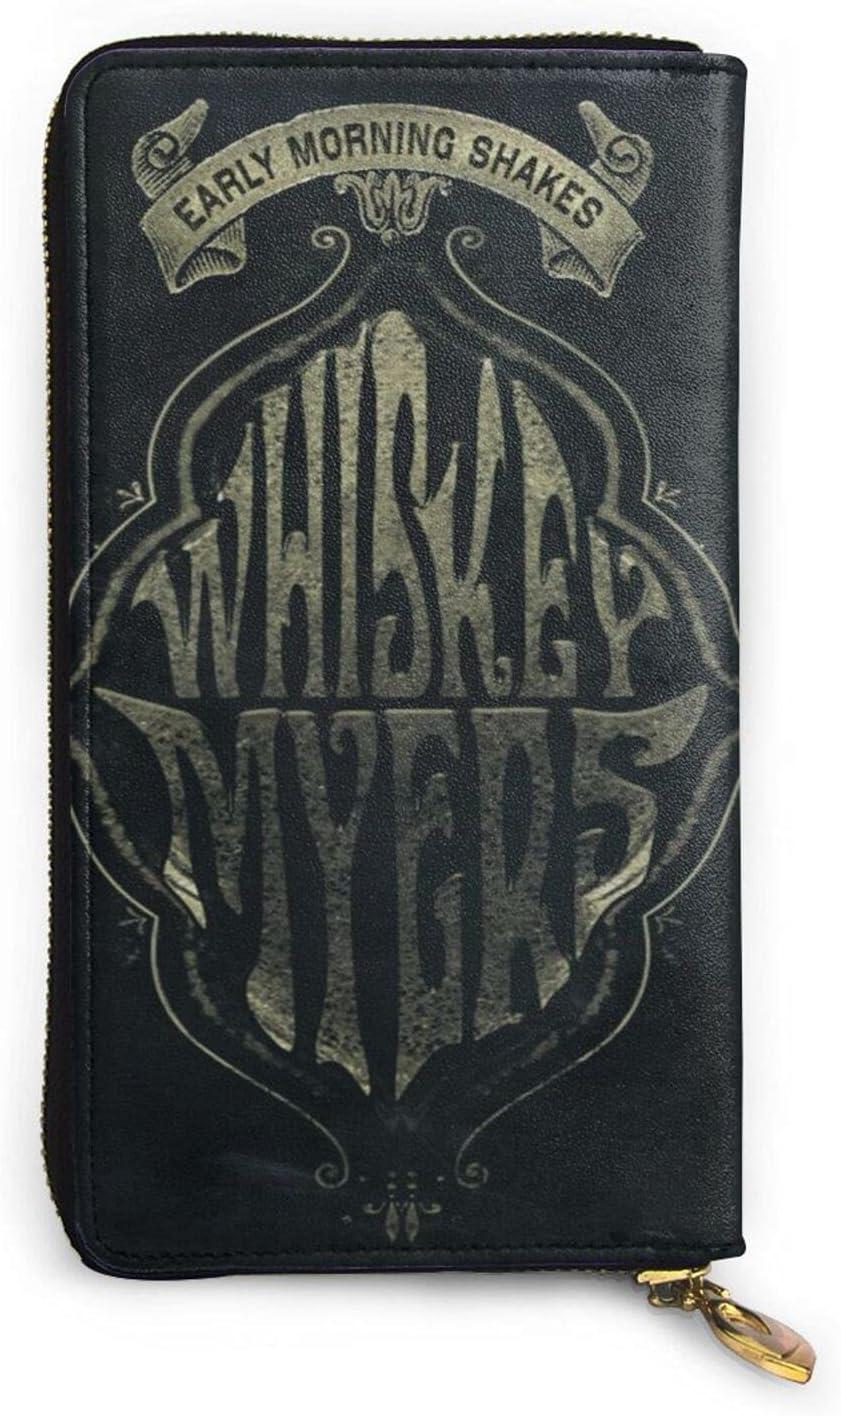 Whiskey Myers Leather Many popular brands Wallet Credit Card For Bag Over item handling Phone Holder Me